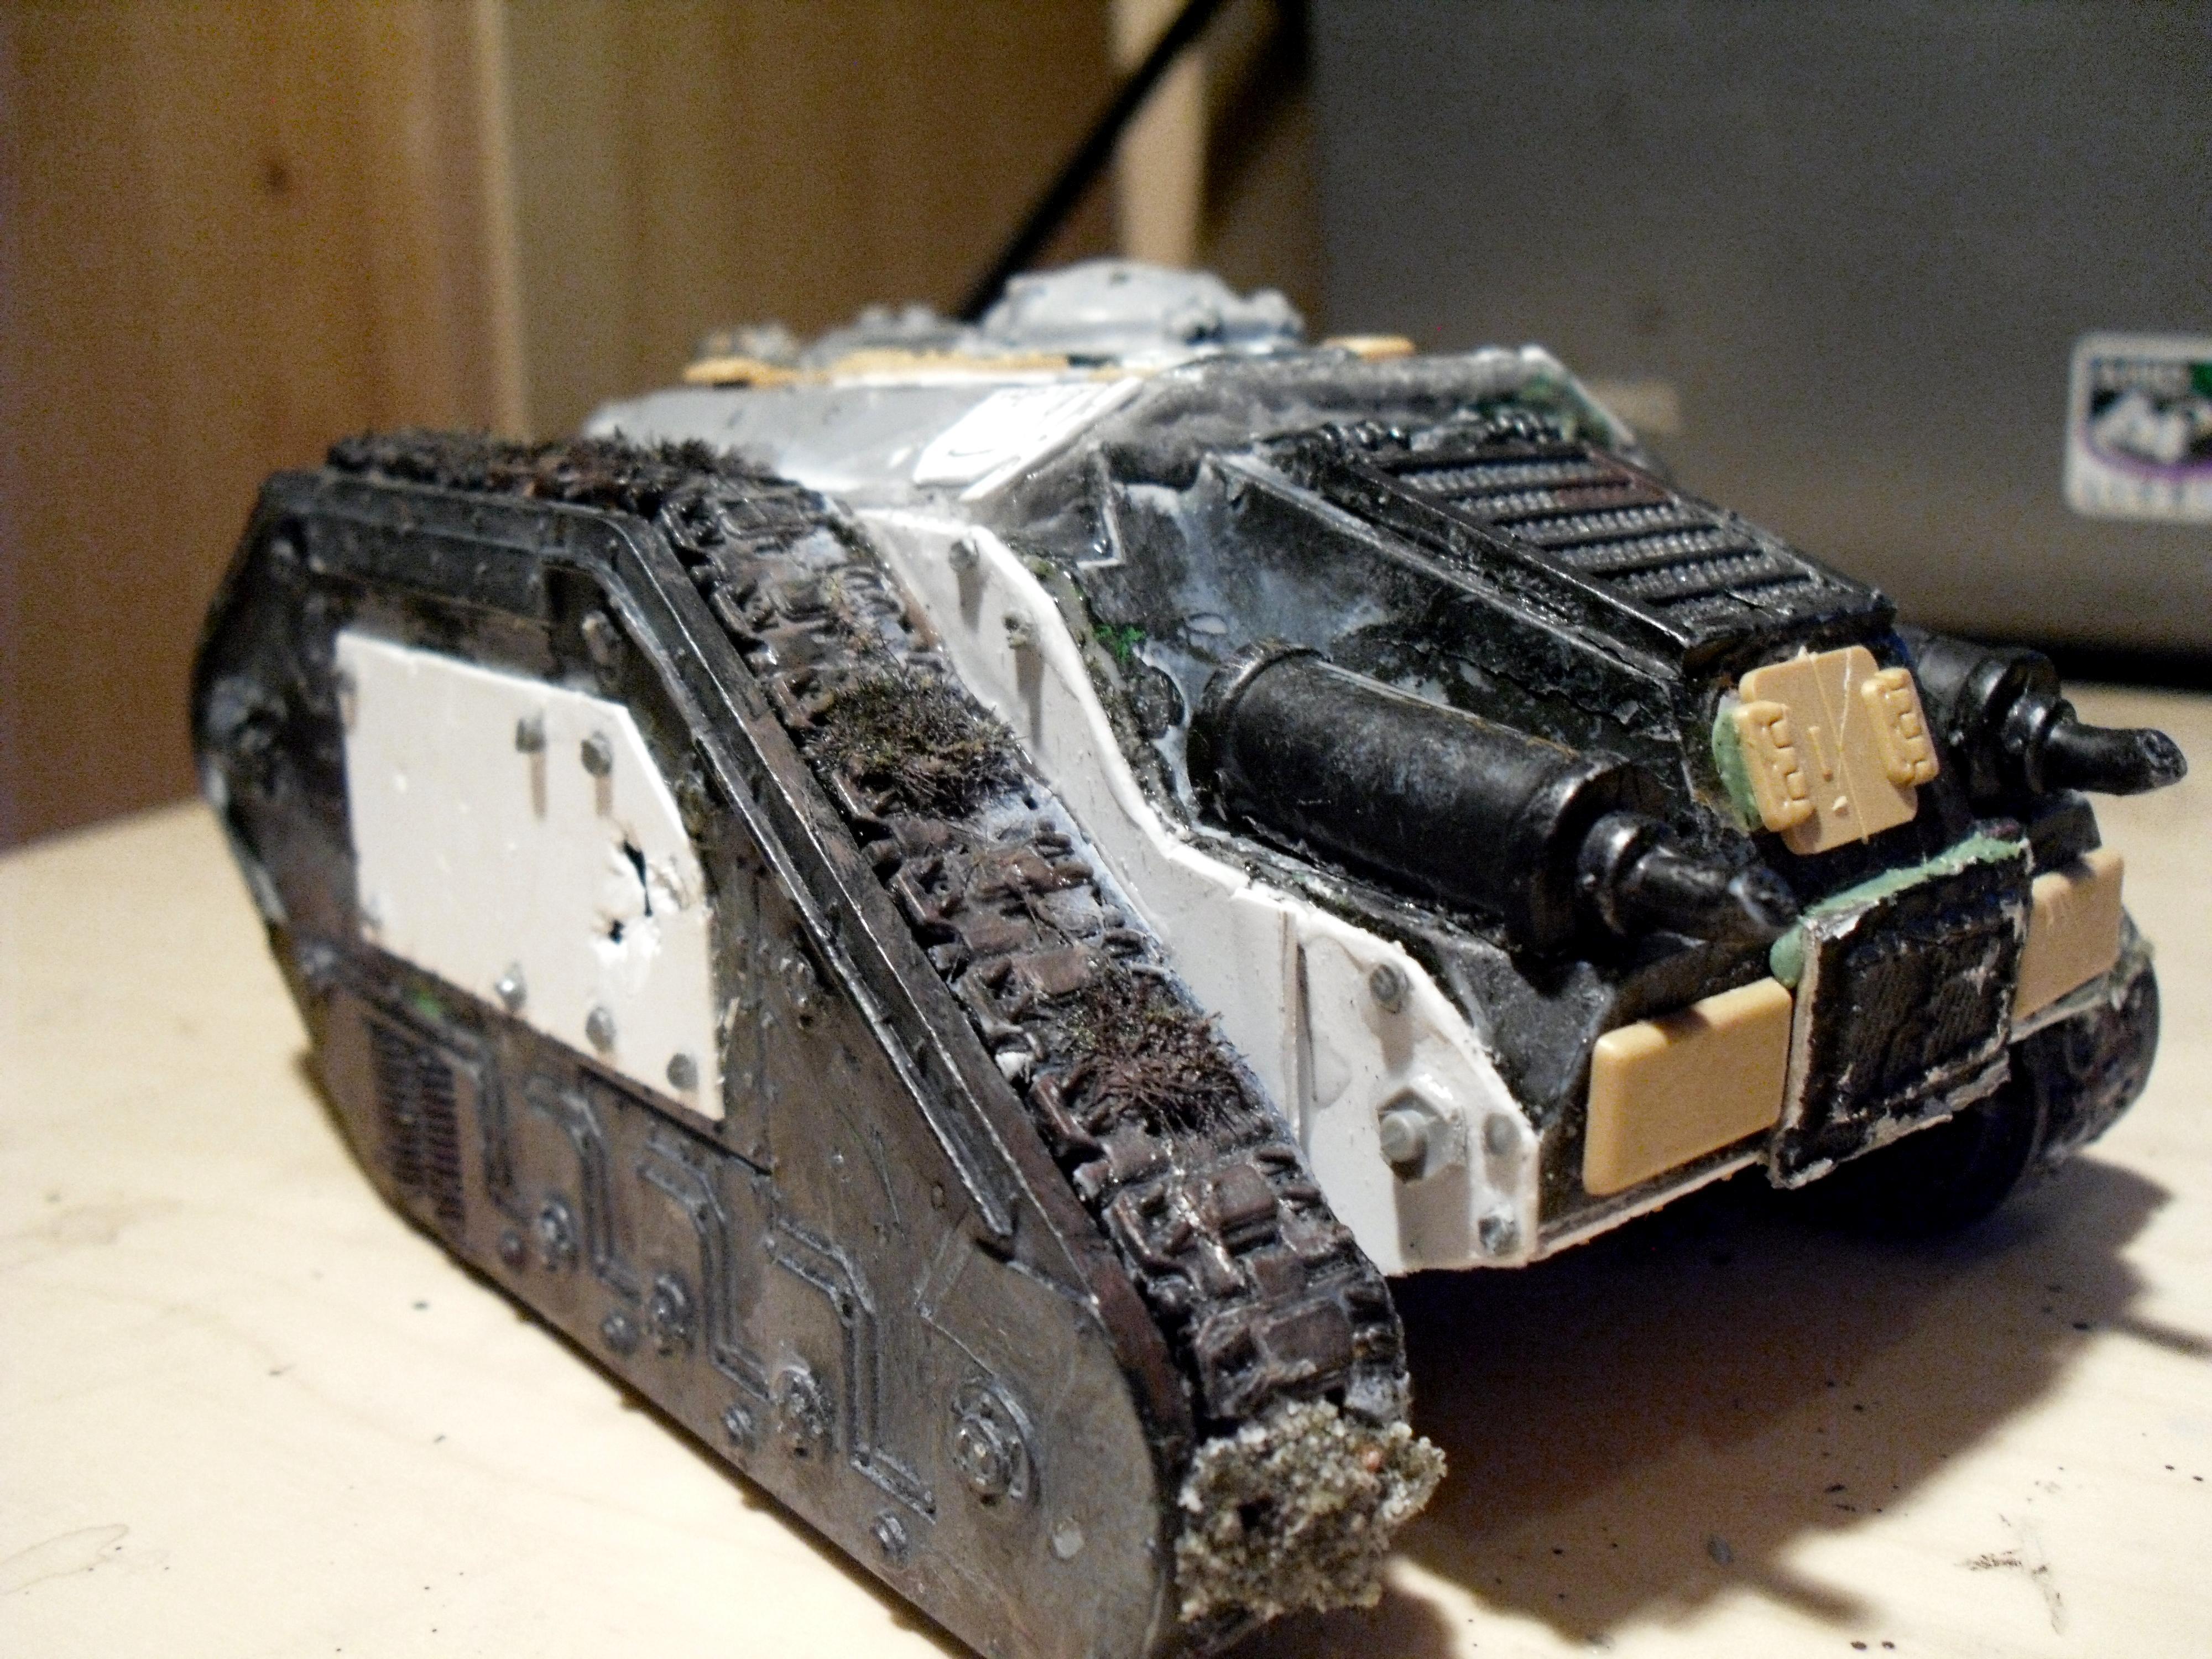 Demolisher, Imperial, Imperial Guard, Leman, Russ, Siege, Tank, Thunderer, Work In Progress